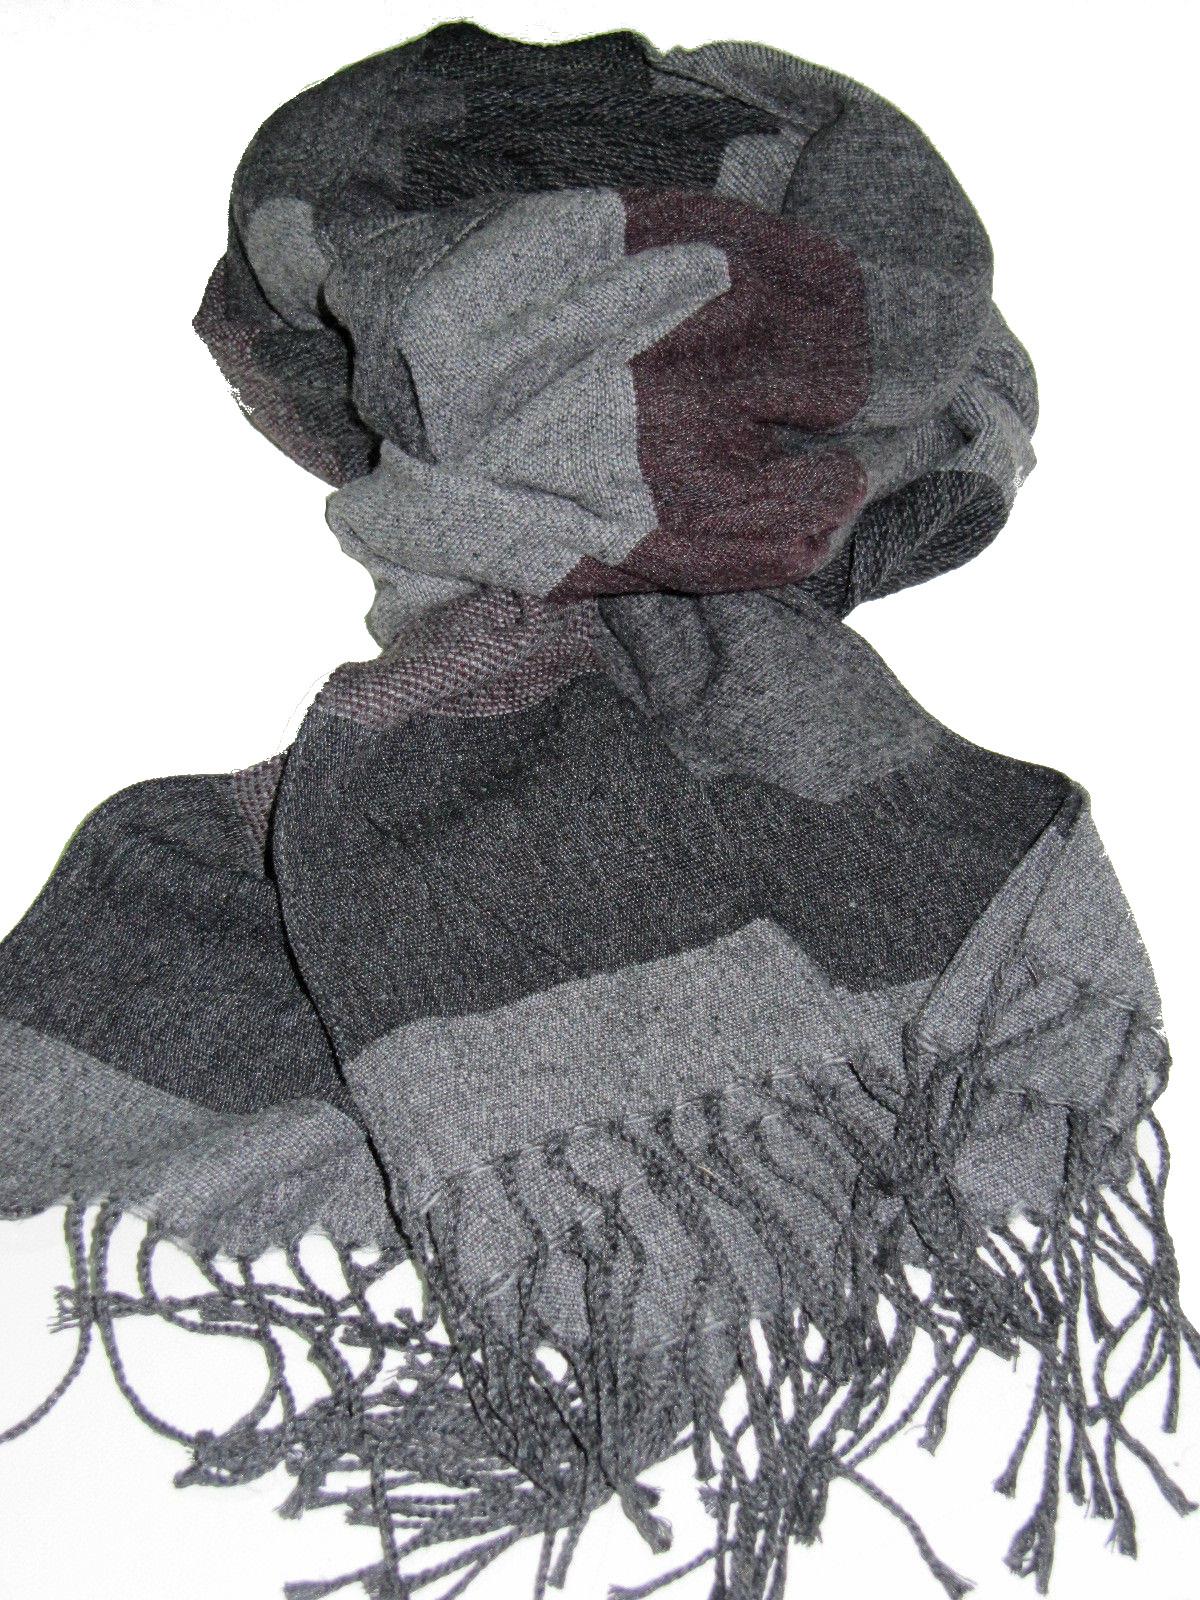 ... sciarpa lana pashmina fasciat wool fashion moda uomo donna prezzo doc  made italy ... 609de97df2af